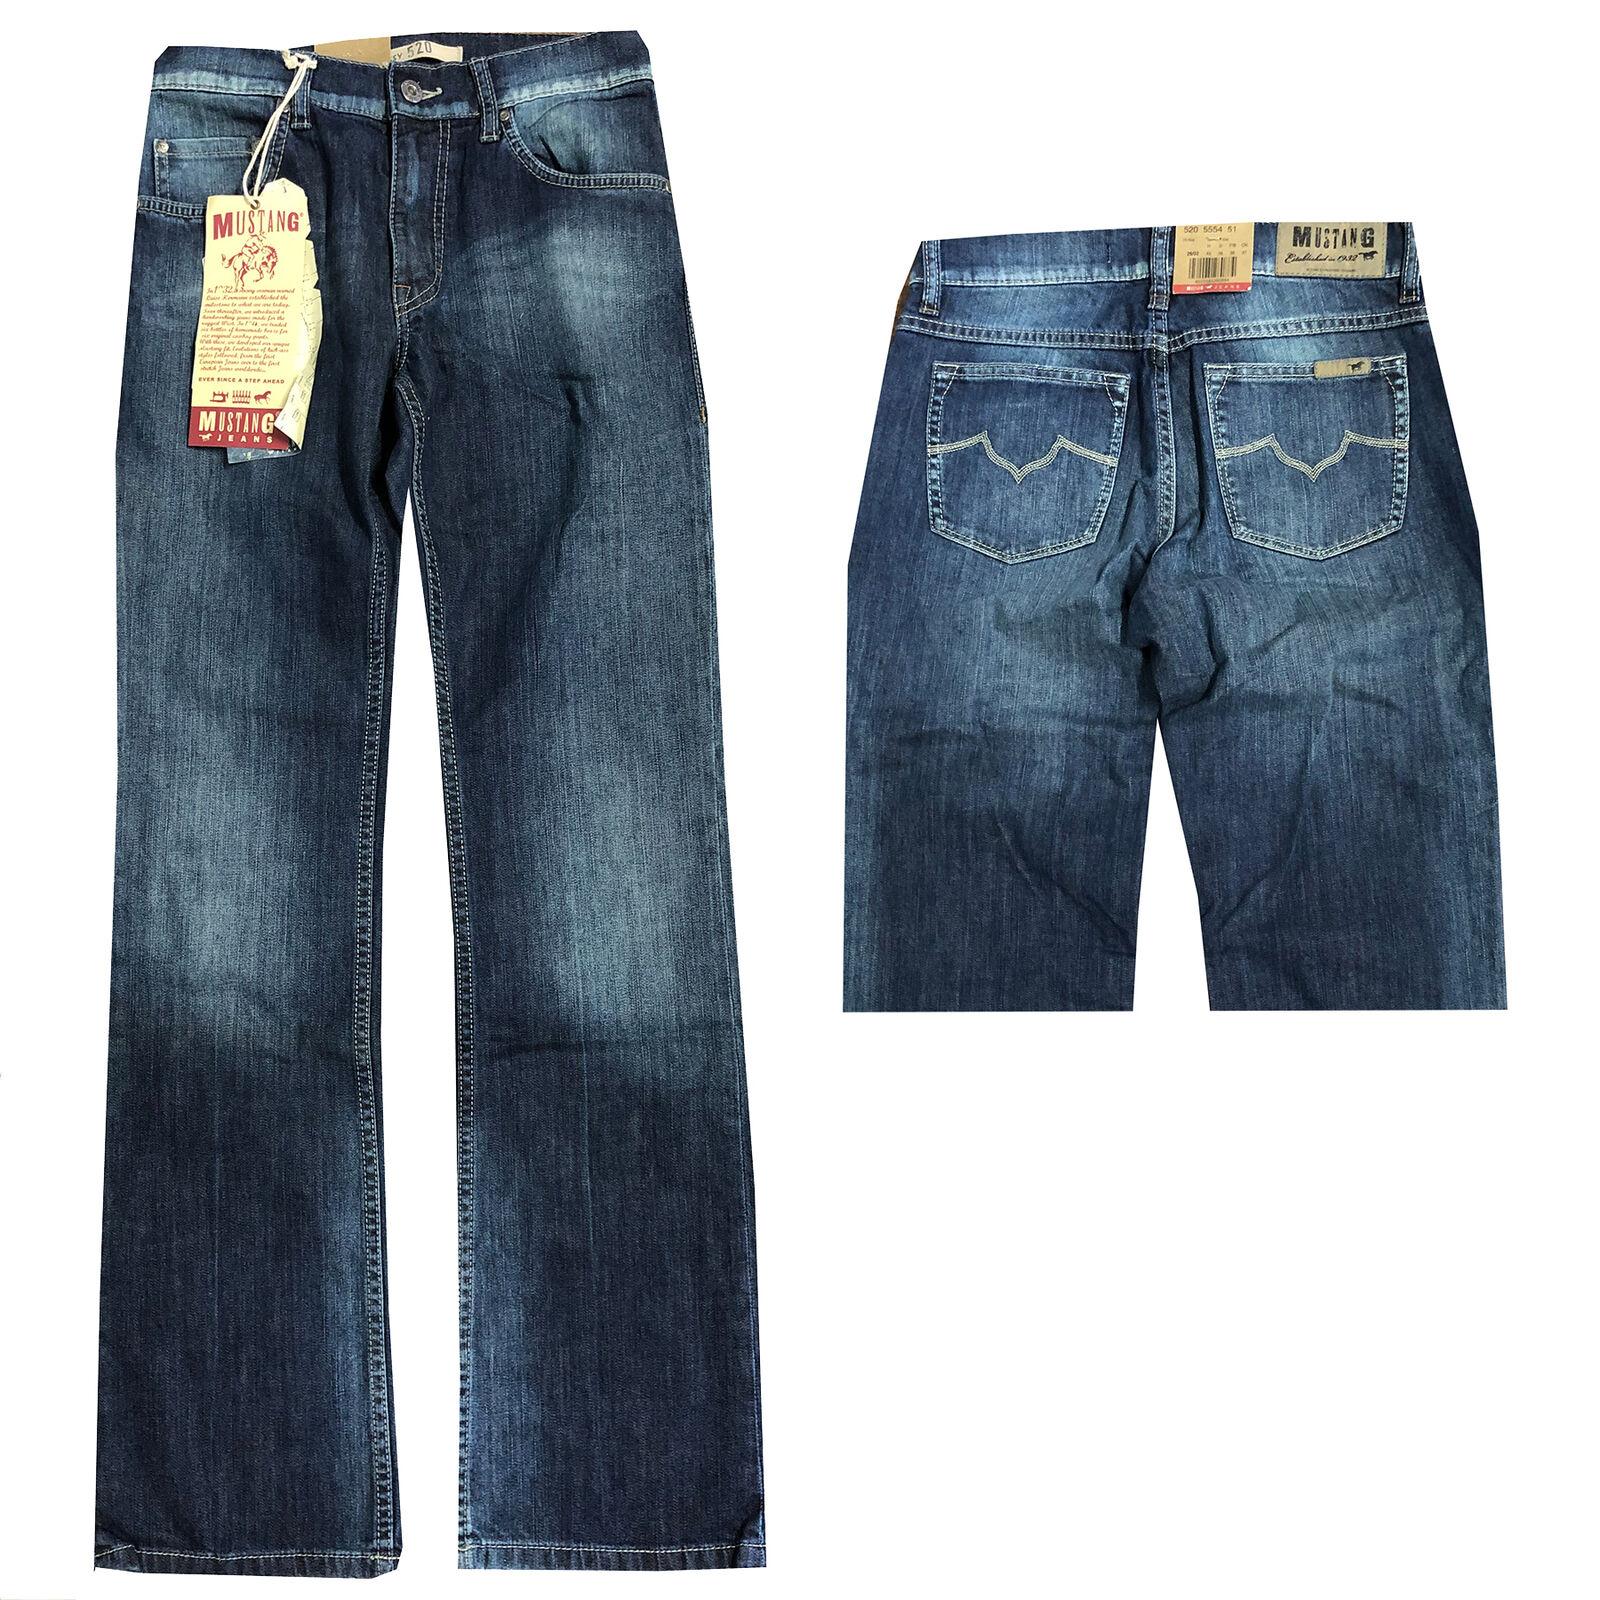 Mustang Sissy Damen Jeans Hose Regular Fit W27 - W29 Länge: L30 - L32 NEU